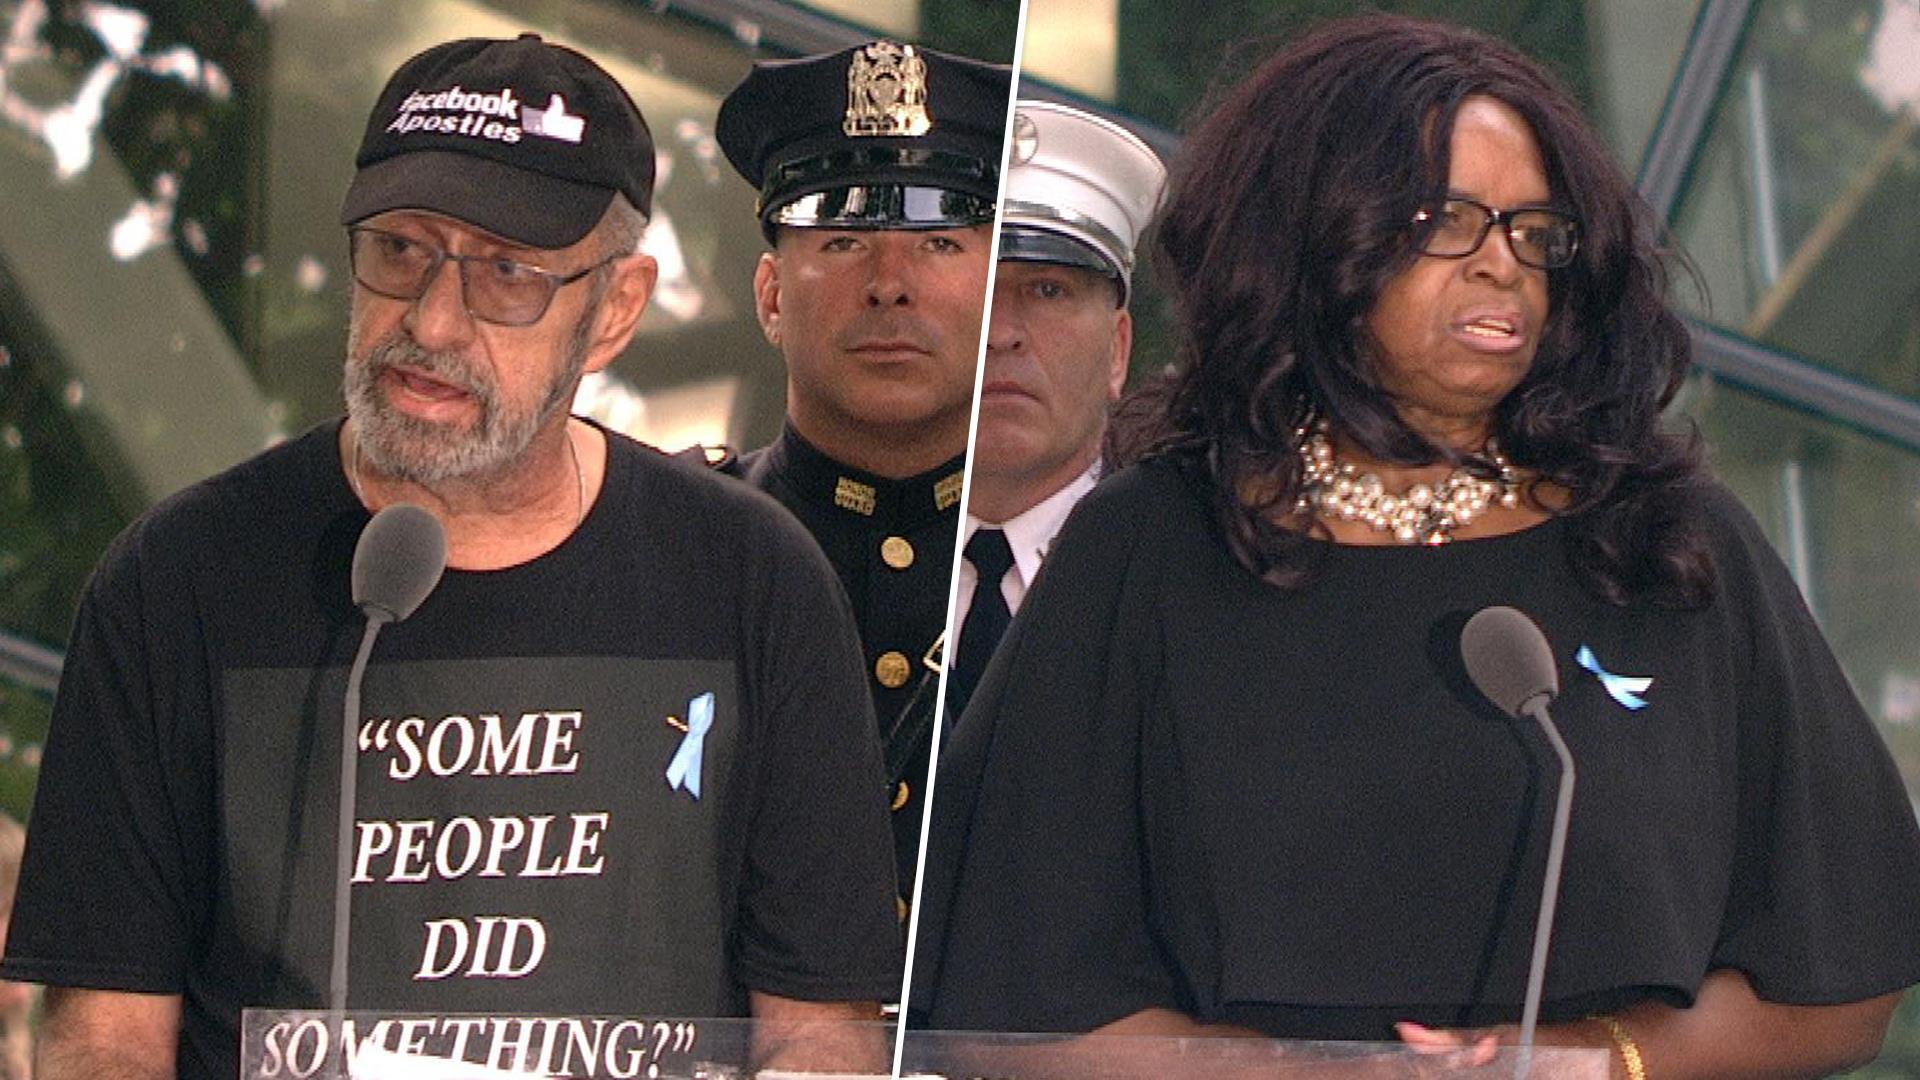 9/11 ceremony readers criticize Rep. Omar, call for gun control